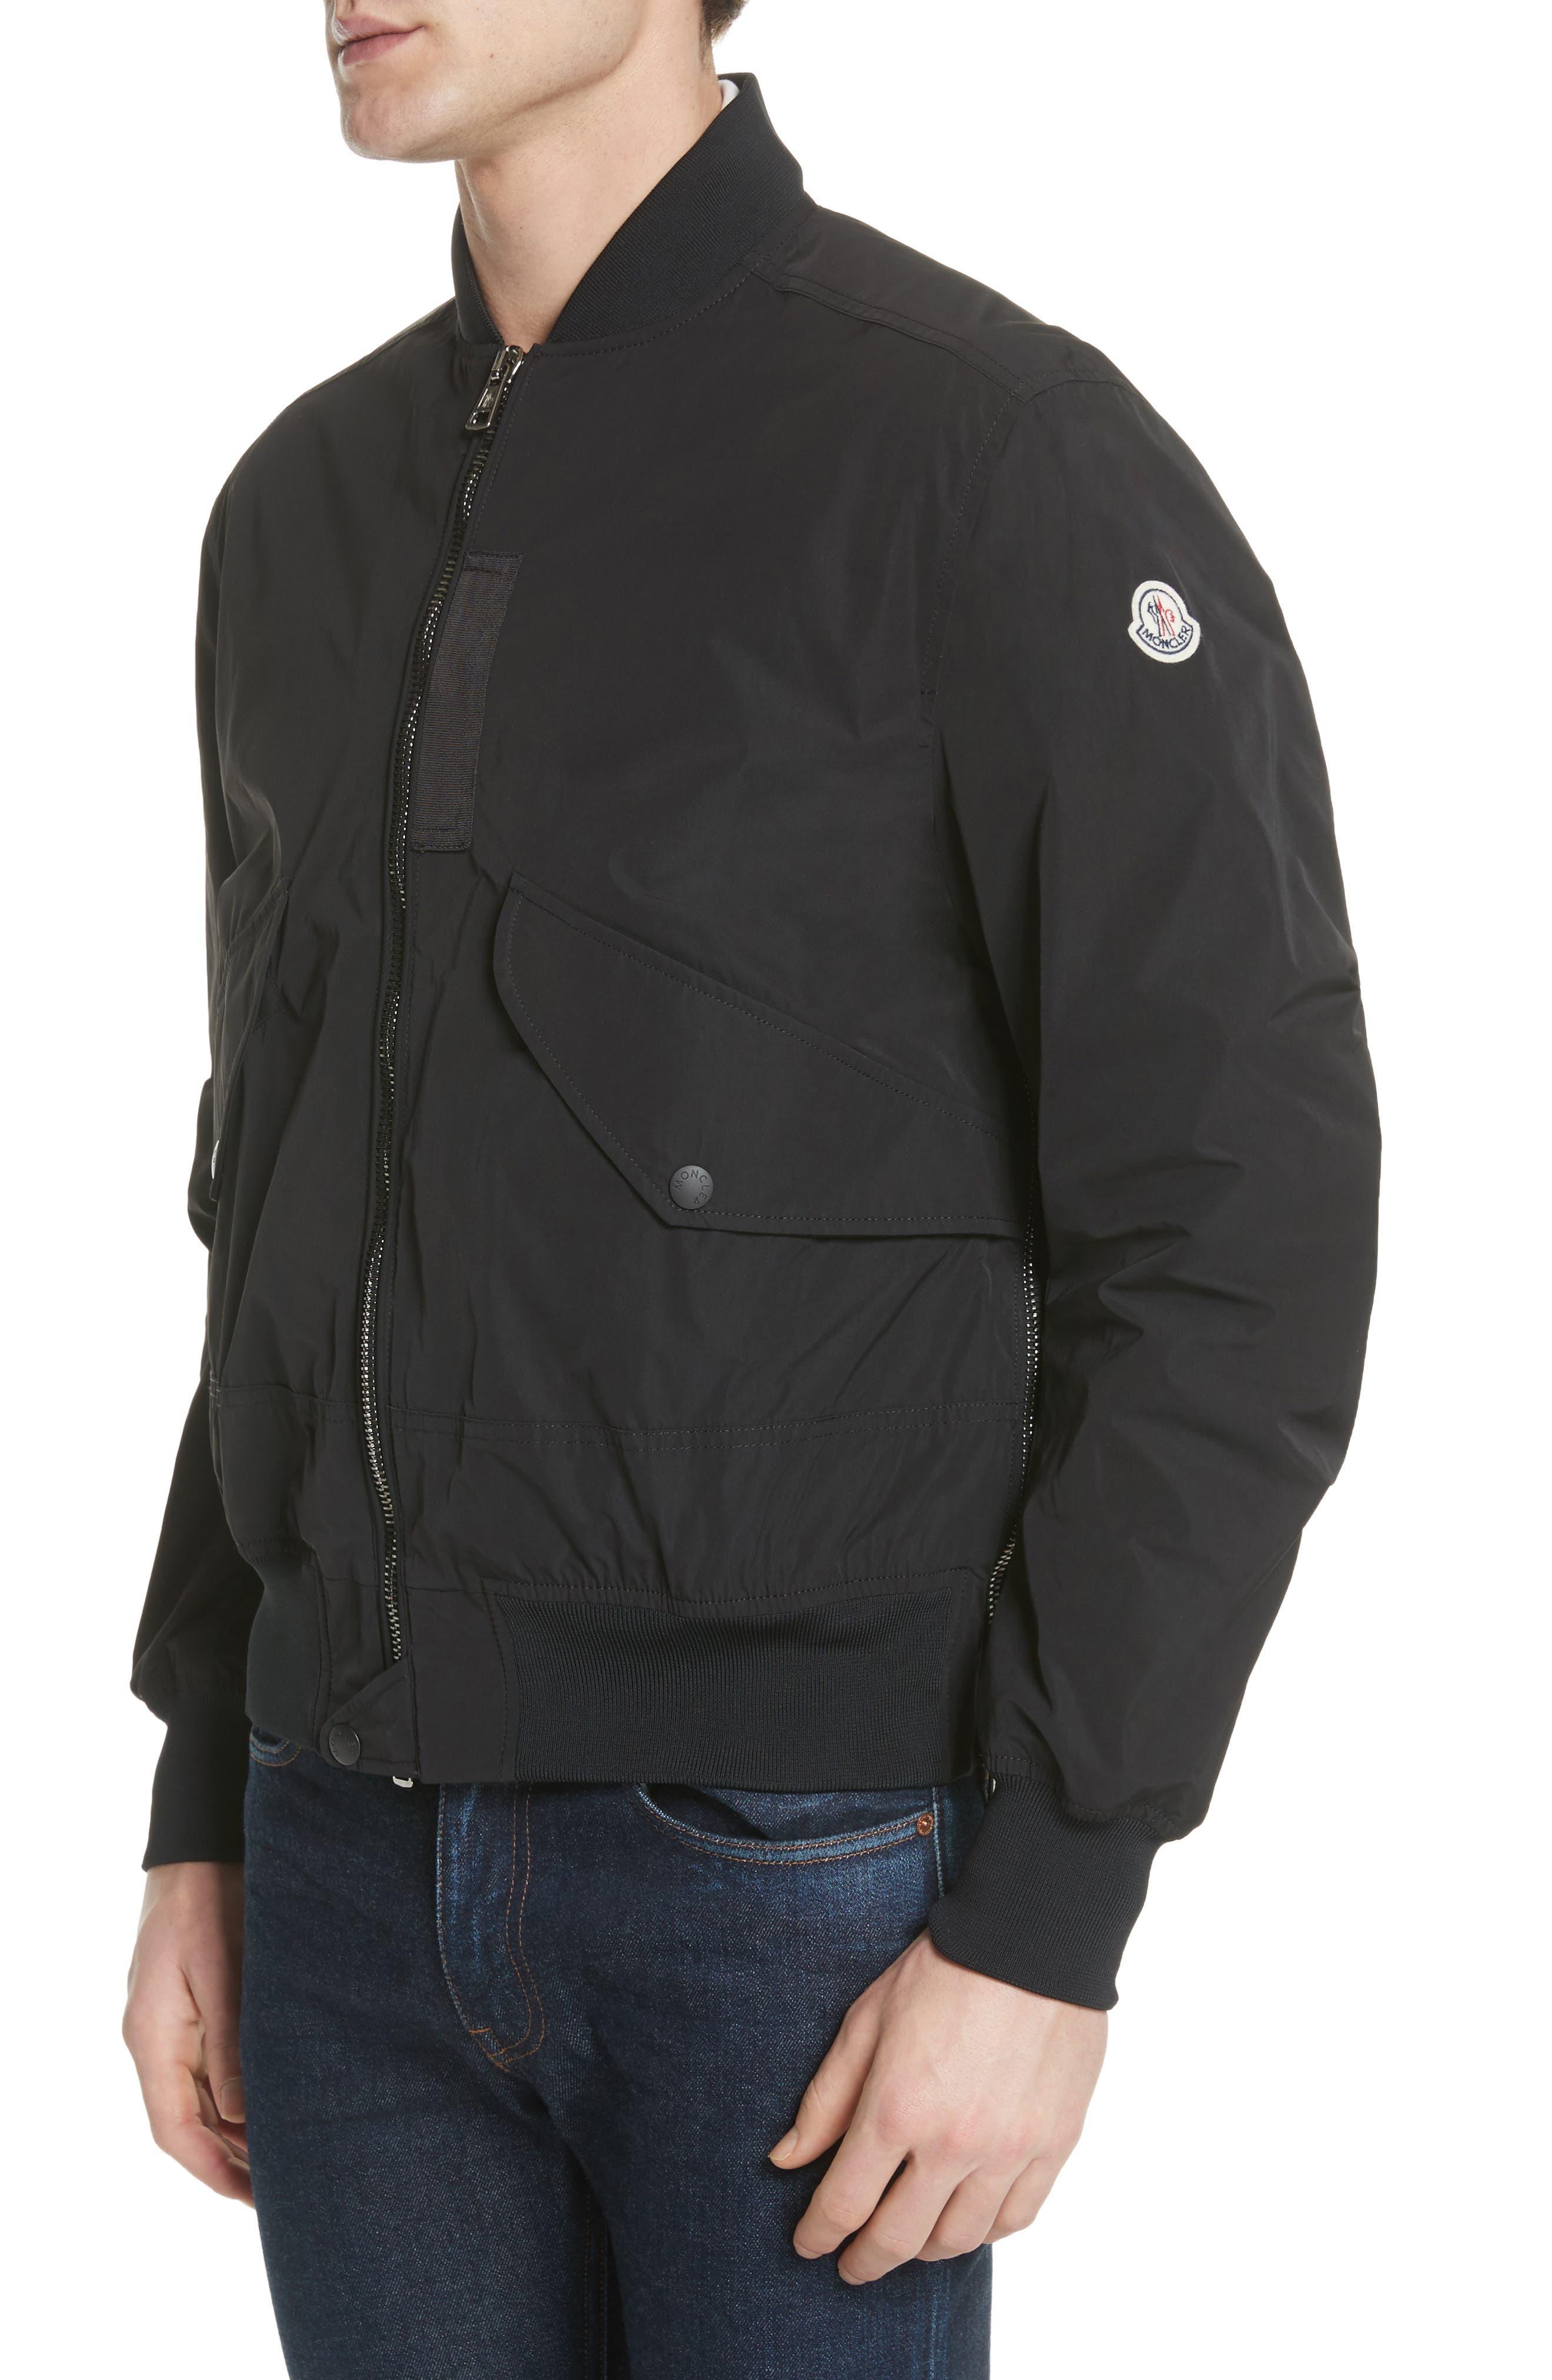 Moncler Artouste Bomber Jacket